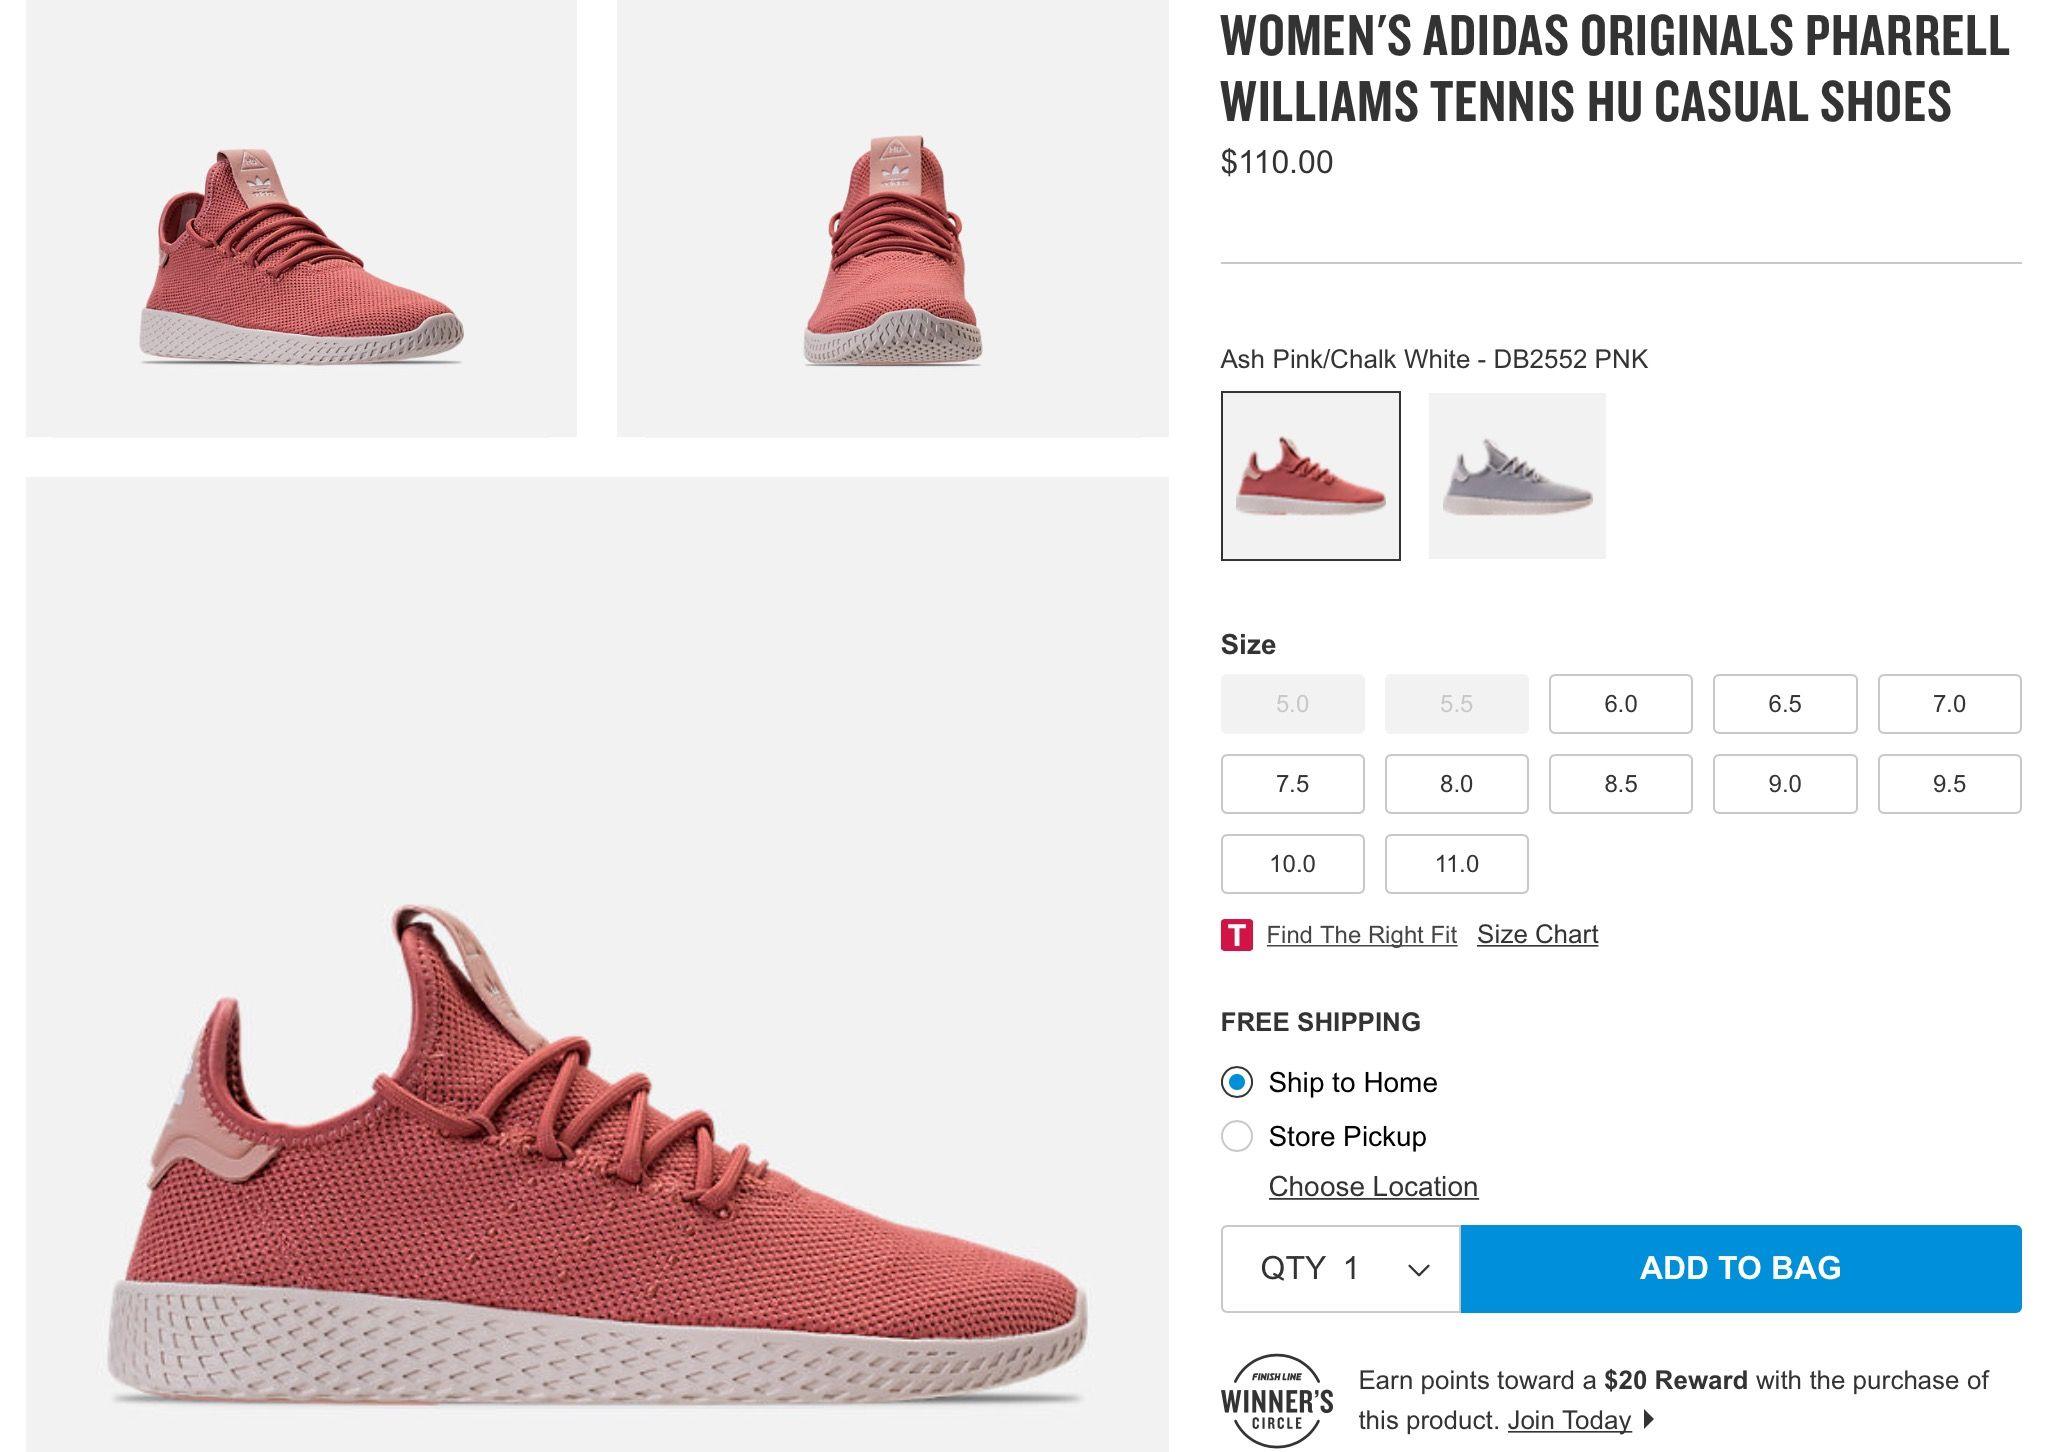 ba72ddfdba03d Finish line.com. Women s adidas originals Pharrell Williams tennis hu  casual shoes in ash